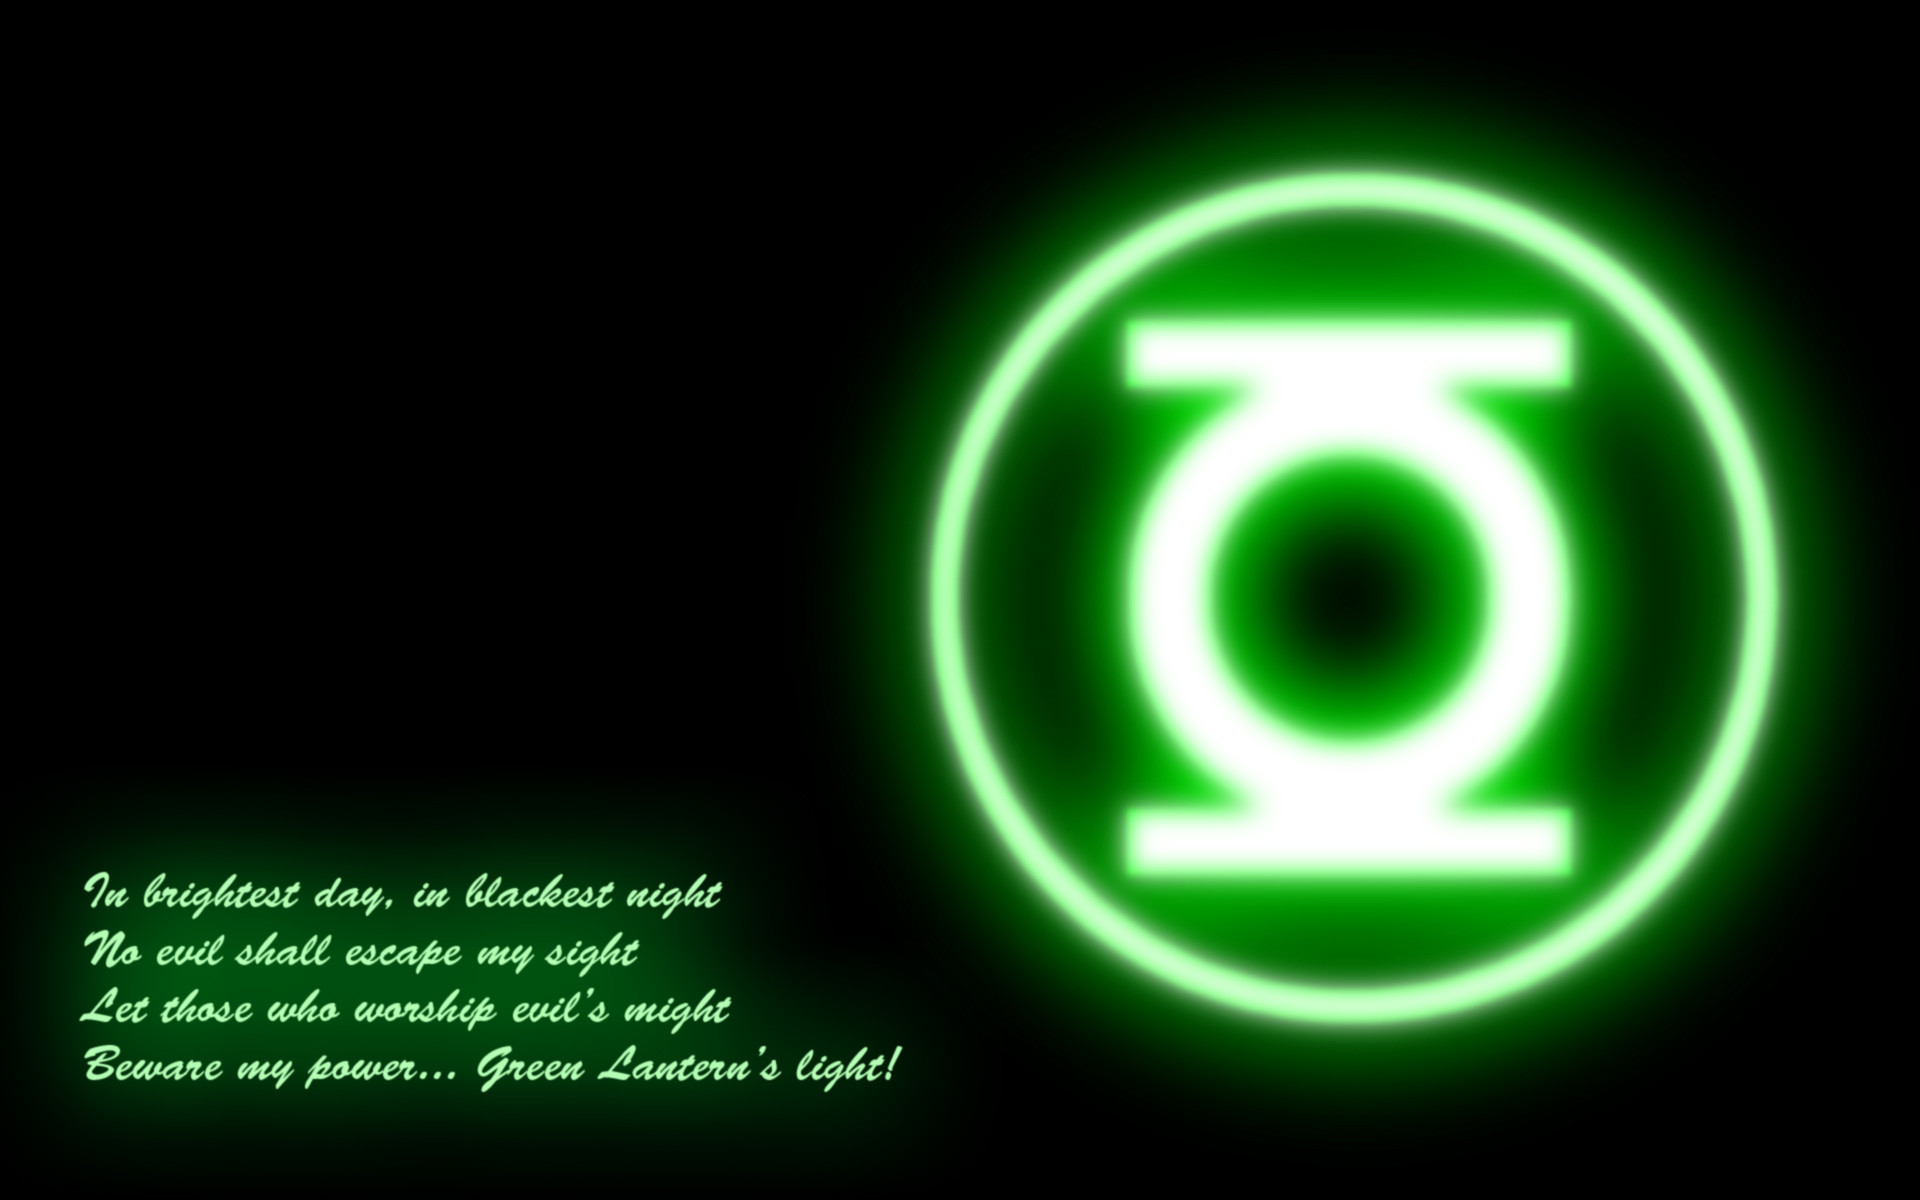 Green Lantern Computer Wallpapers, Desktop Backgrounds   .